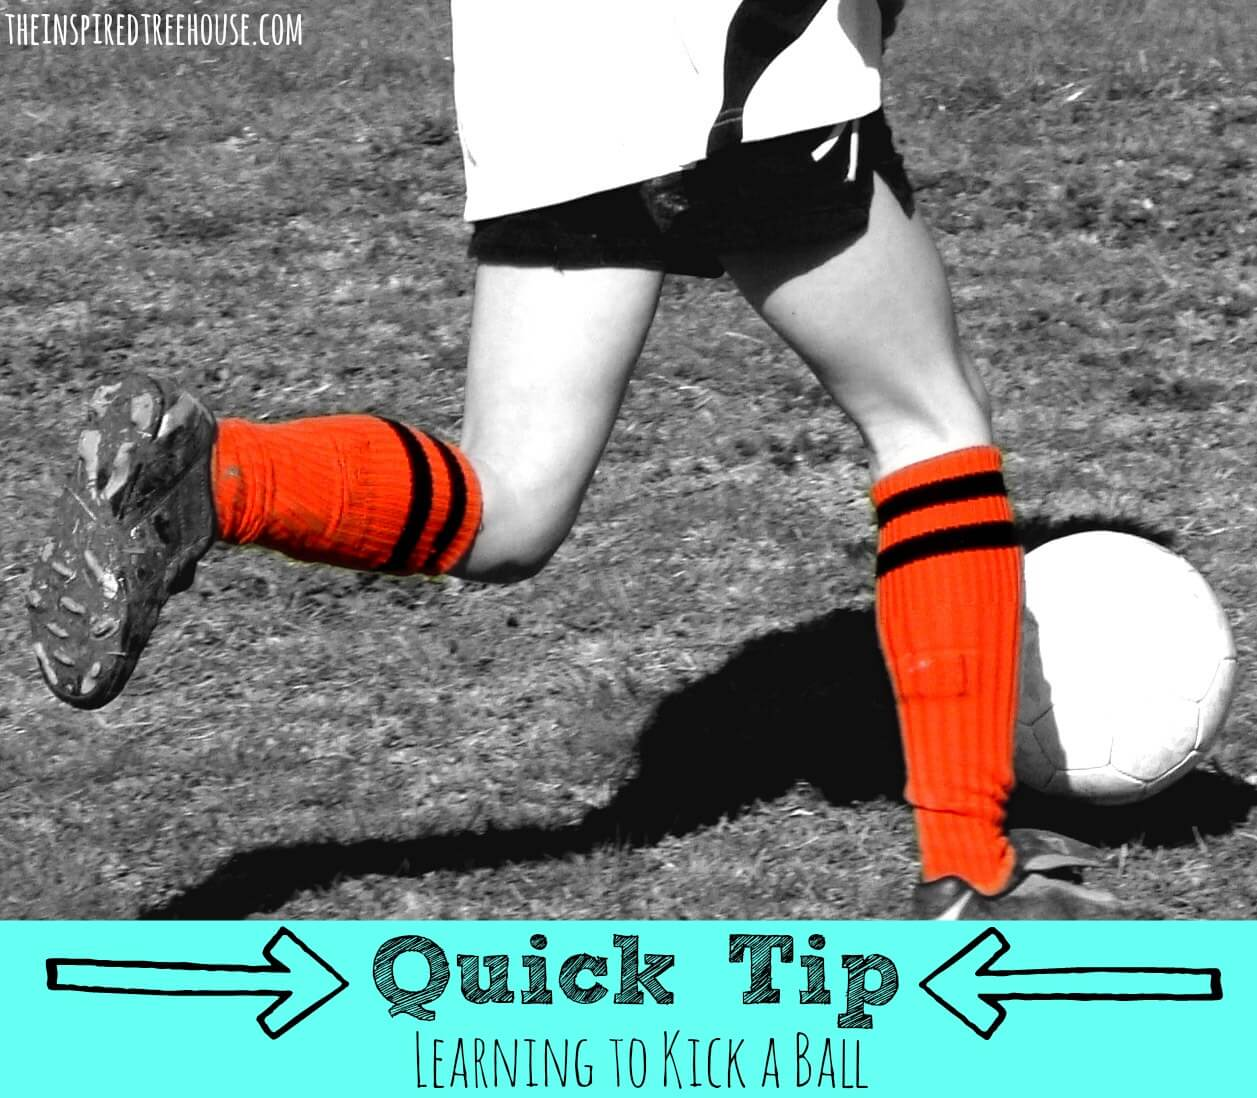 Balance Ball Kick: CHILD DEVELOPMENT QUICK TIP: LEARNING TO KICK A BALL